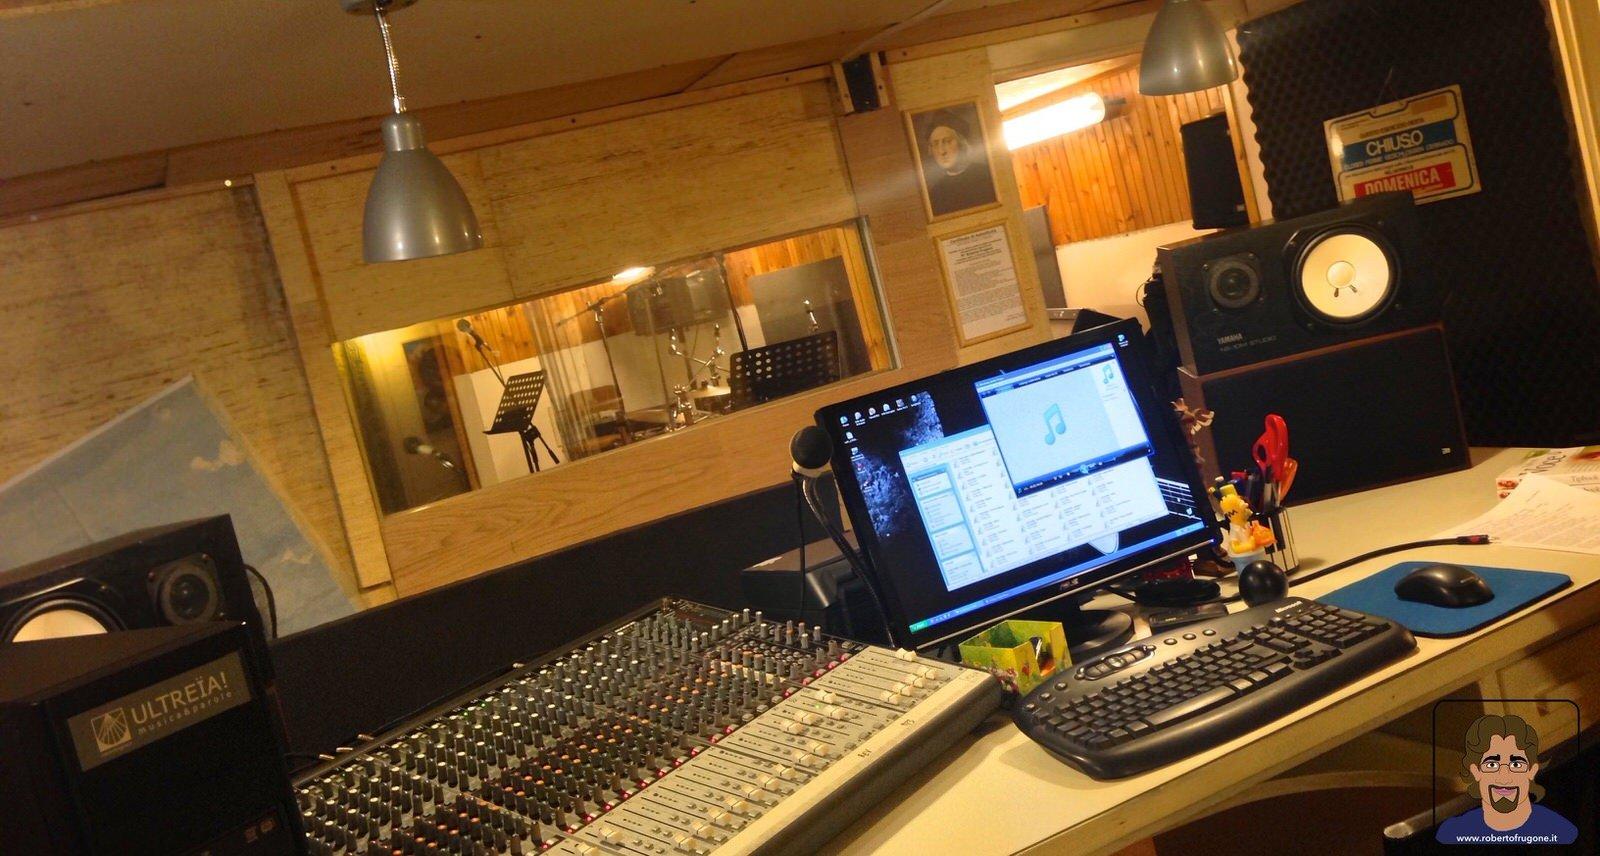 Totem Studio Sala Prove Musicali Casarza Ligure regia mixer